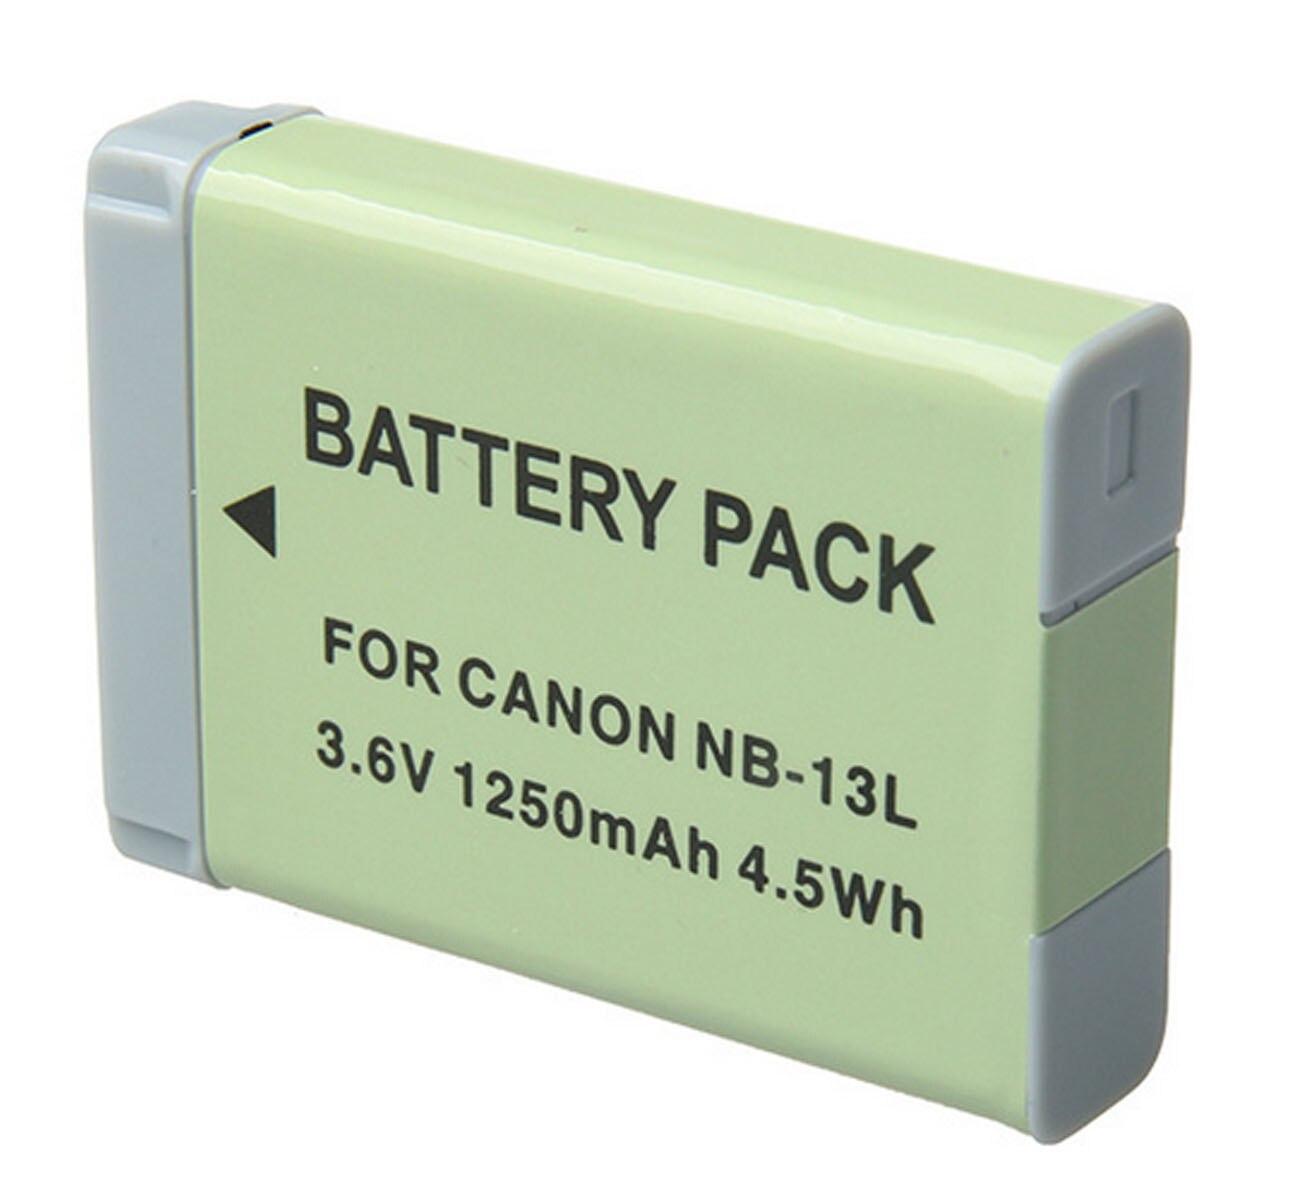 NB-13L Battery Pack For Canon PowerShot SX620, SX720, SX730, SX740 HS, SX620HS, SX720HS, SX730HS, SX740HS Digital Camera